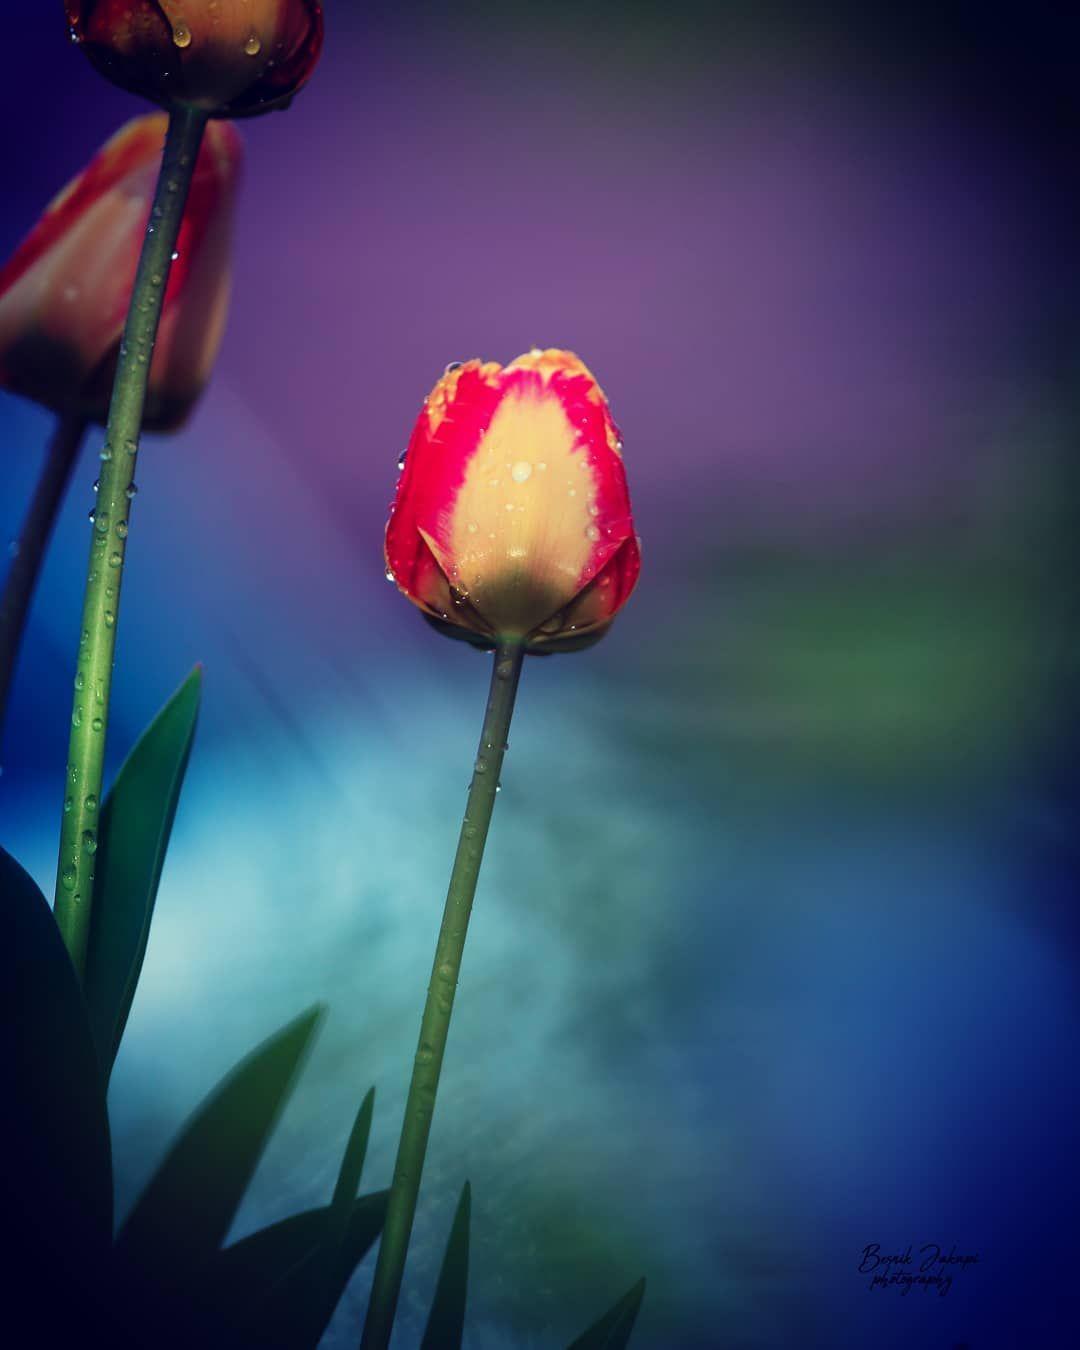 Tulip Flower Dreamy Mornin Flowers Nature Love Beautiful Photography Art Flower Tulip Flower Dreamy Mornin Flowers Nature Love Beautiful Photogra